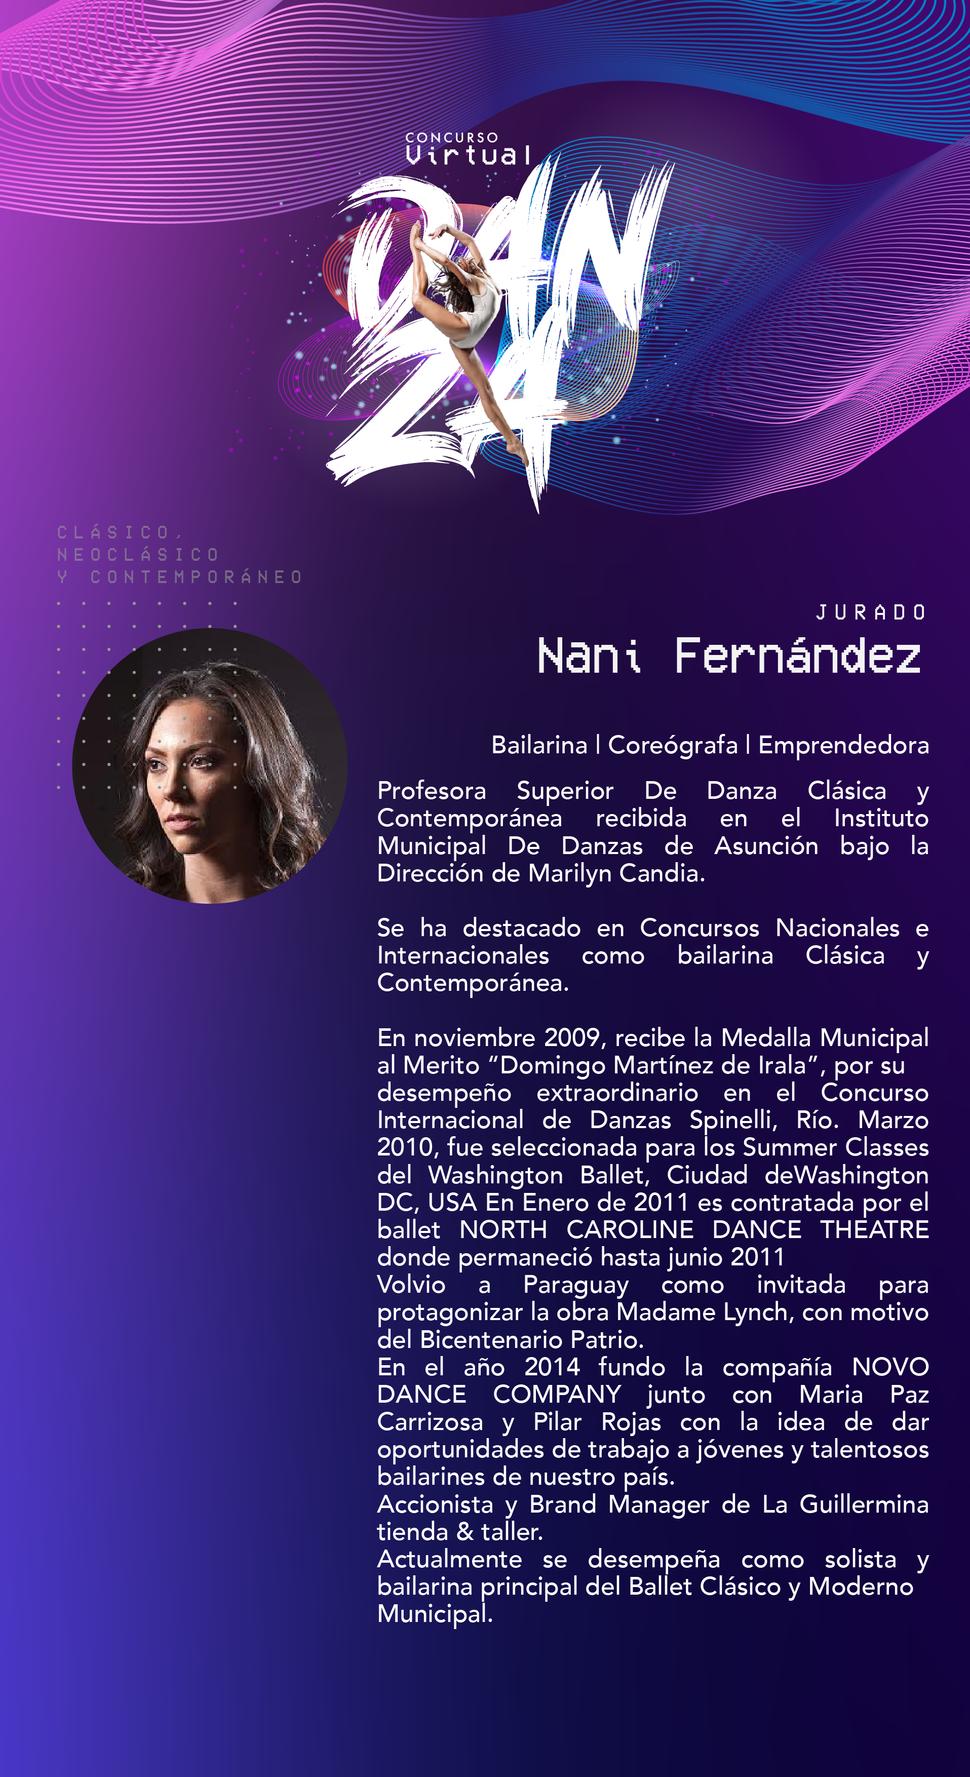 Jurado_ Giannina Fernández